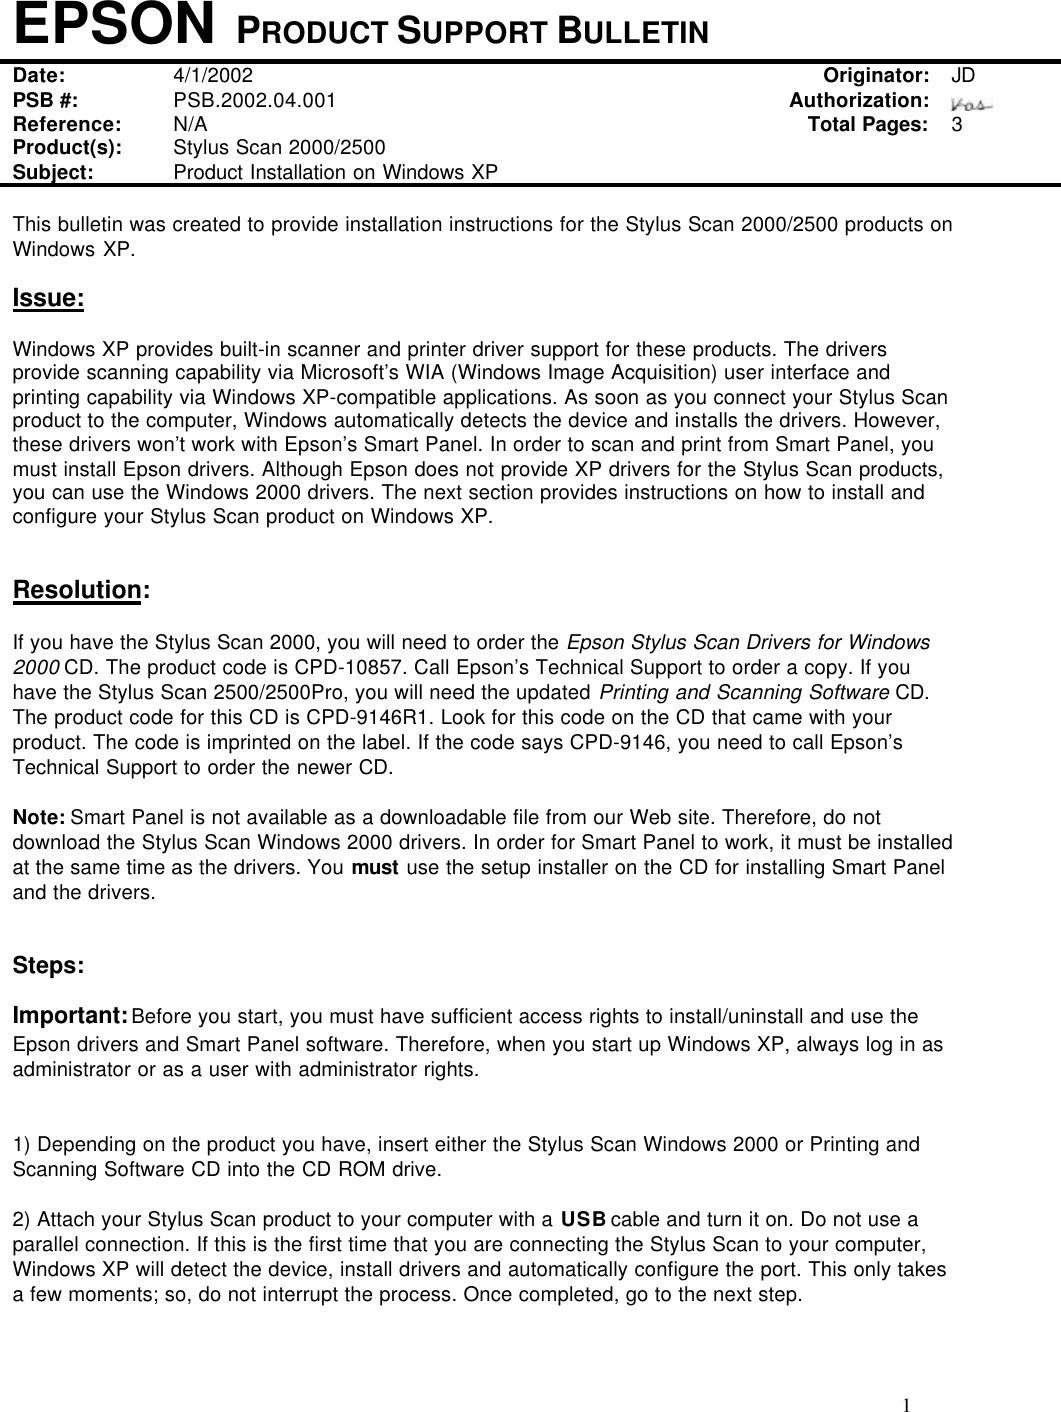 EPSON STYLUS SCAN 2000 TWAIN WINDOWS 10 DRIVER